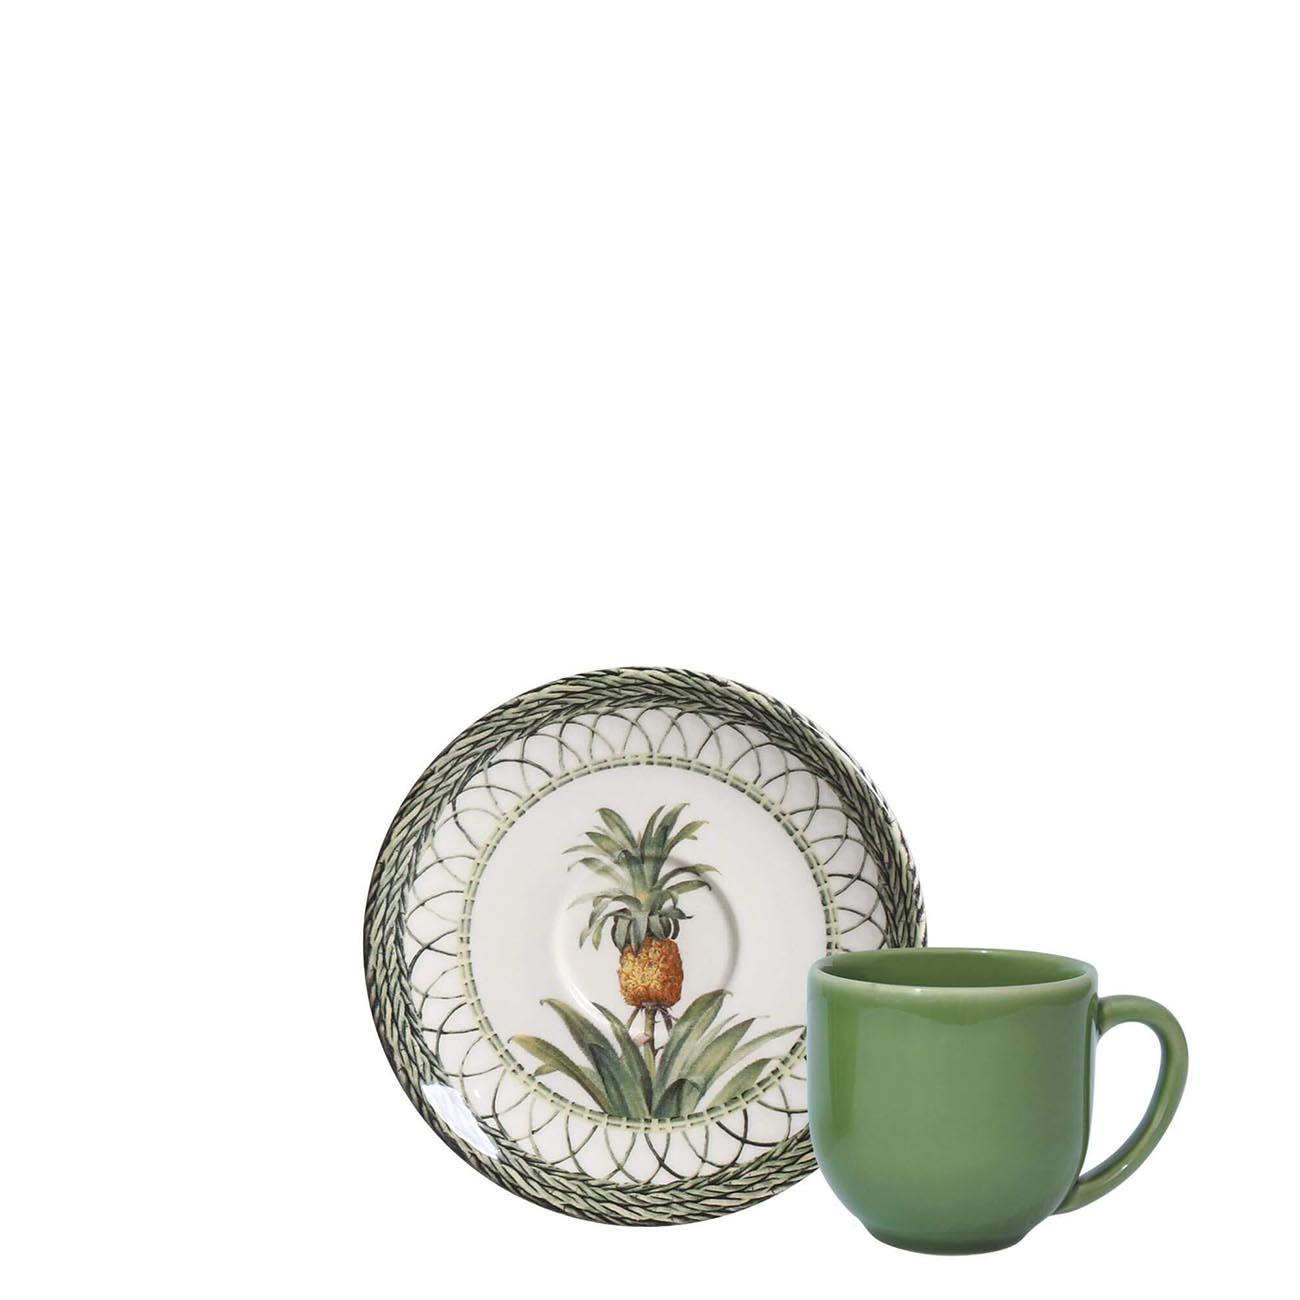 CONJUNTO XICARAS DE CAFE PINEAPPLE GREEN 6PCS PORTO BRASIL